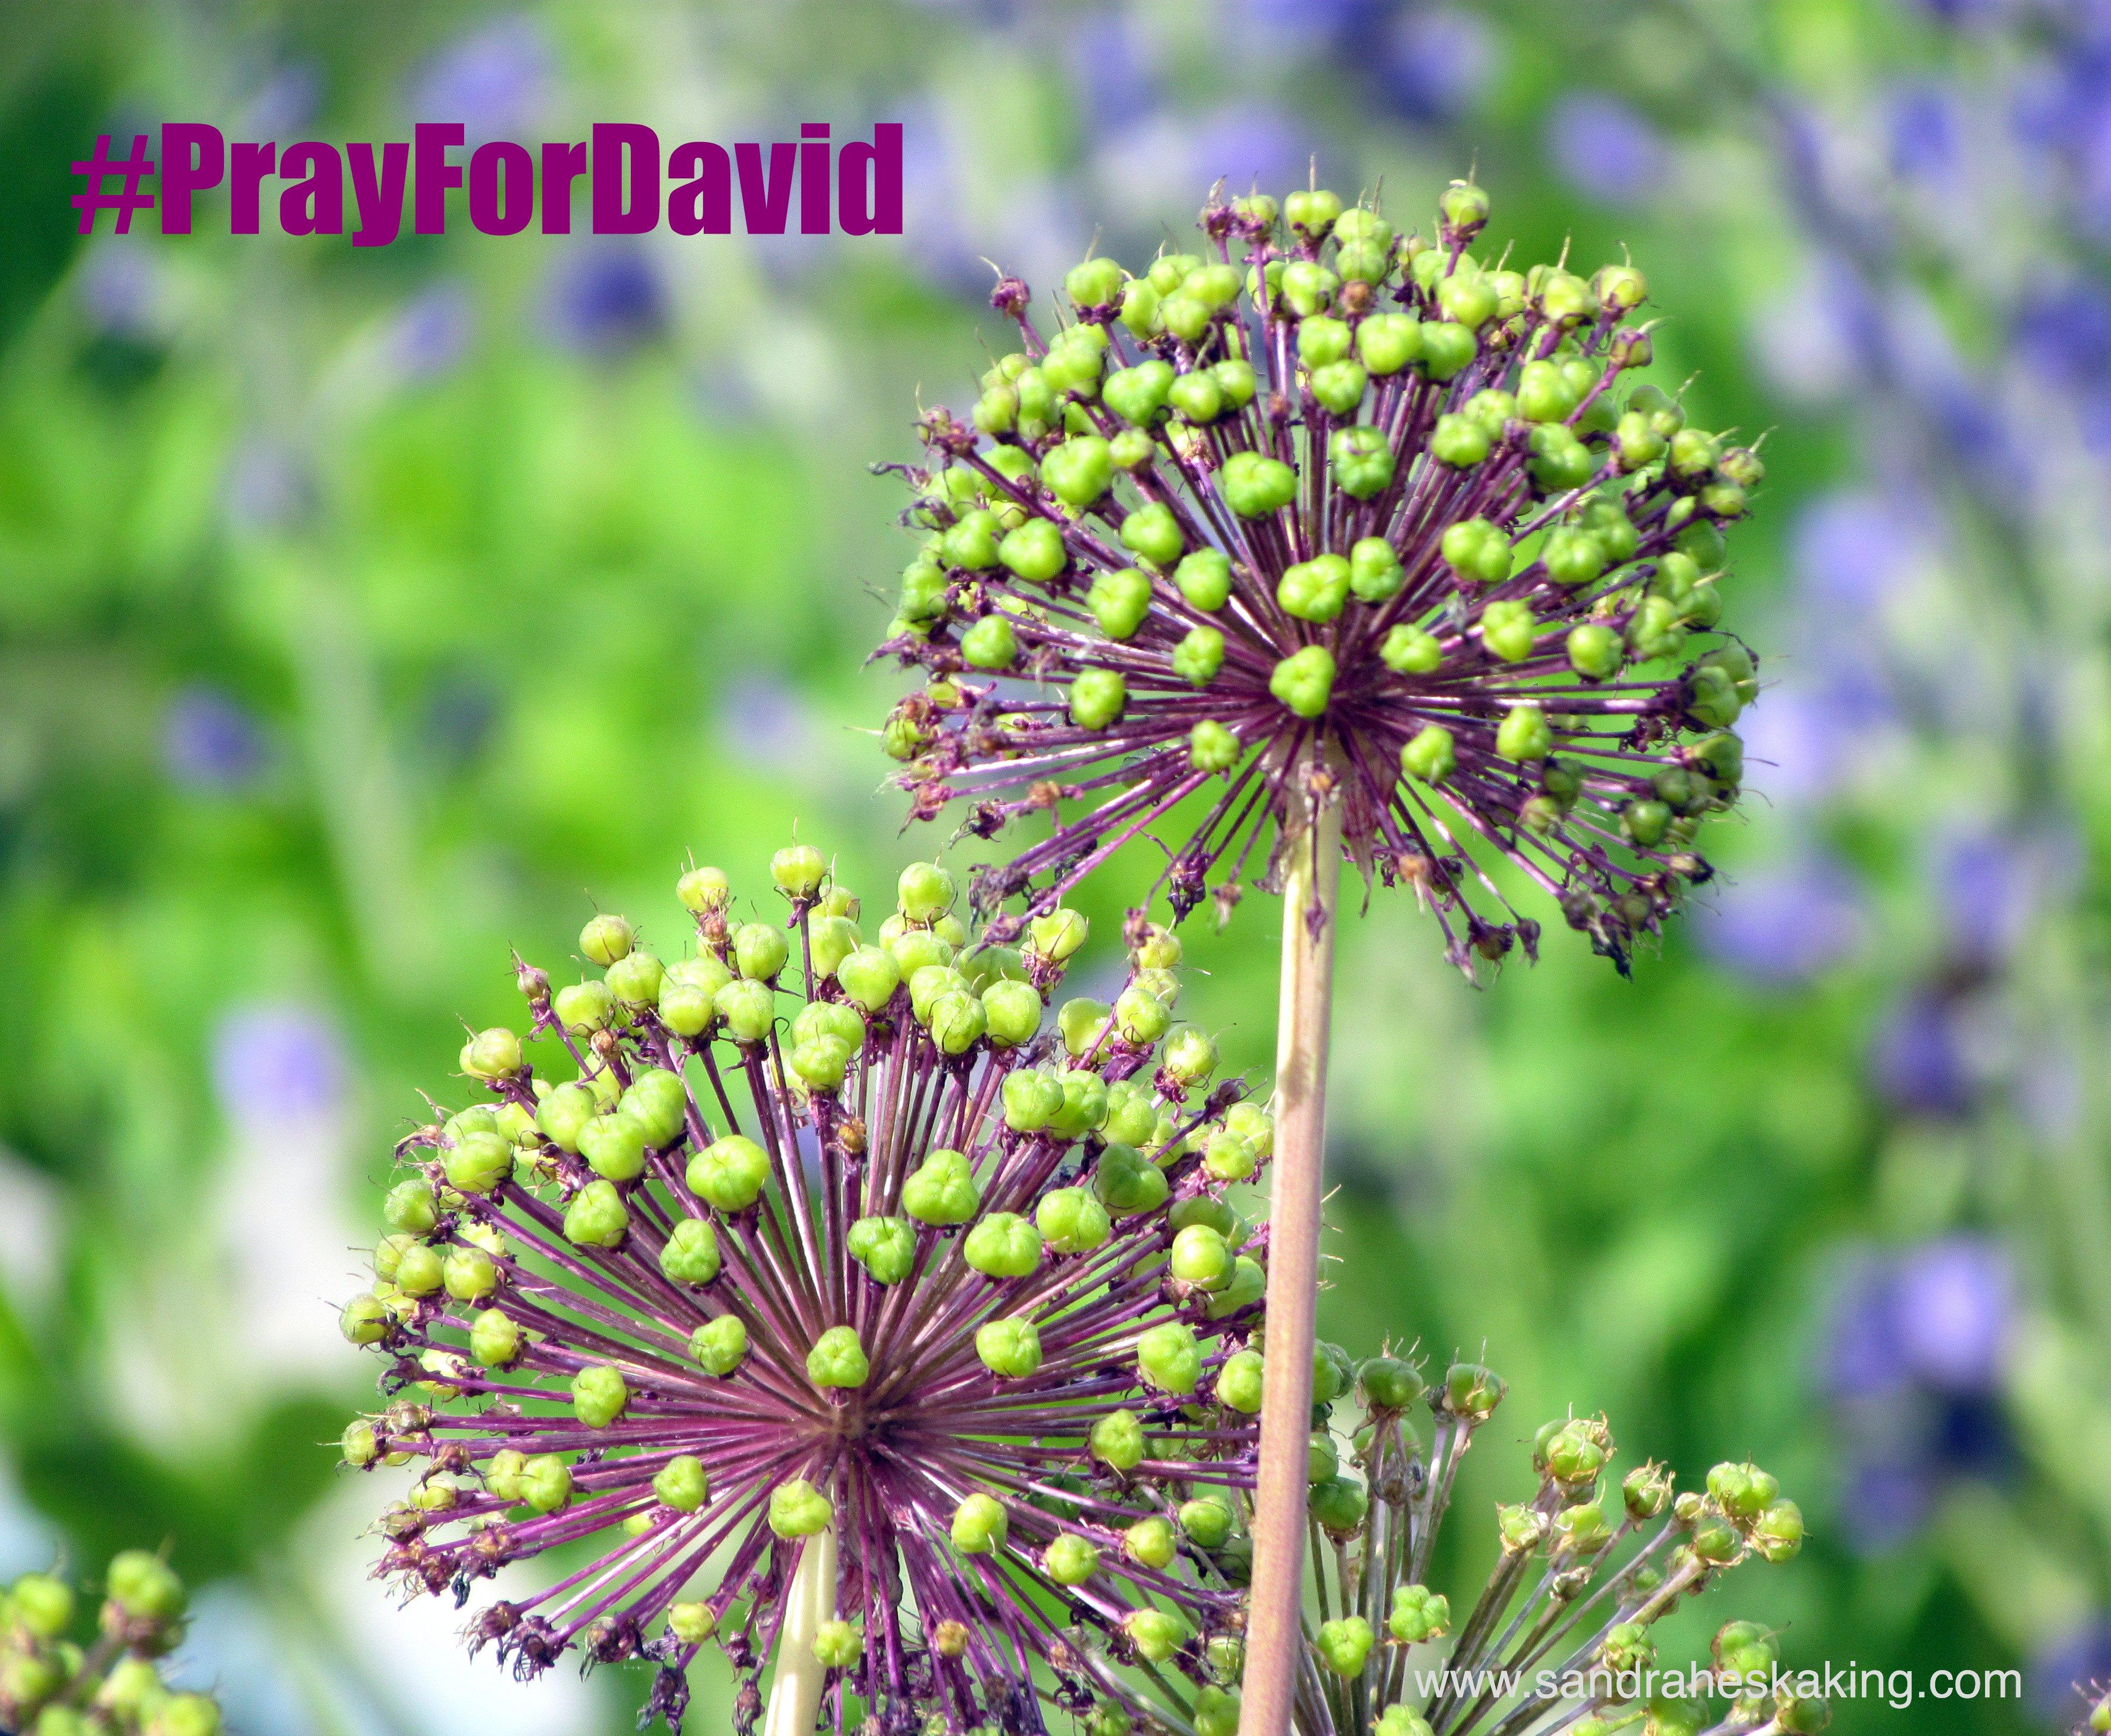 in which cancer brings clarity #PrayForDavid